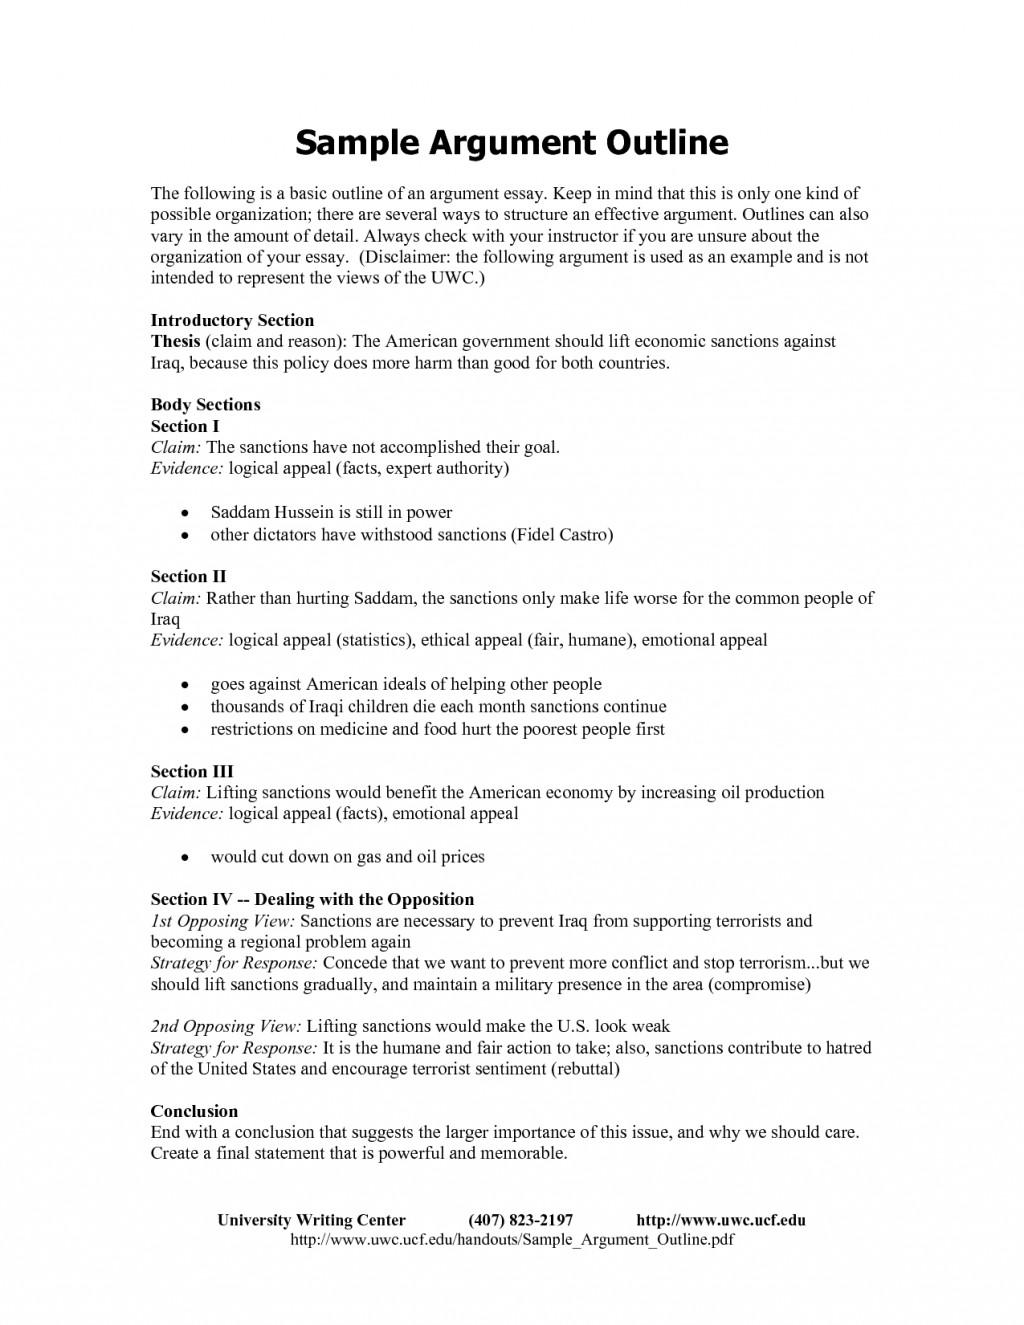 003 Argument Essay Outline Format Research An